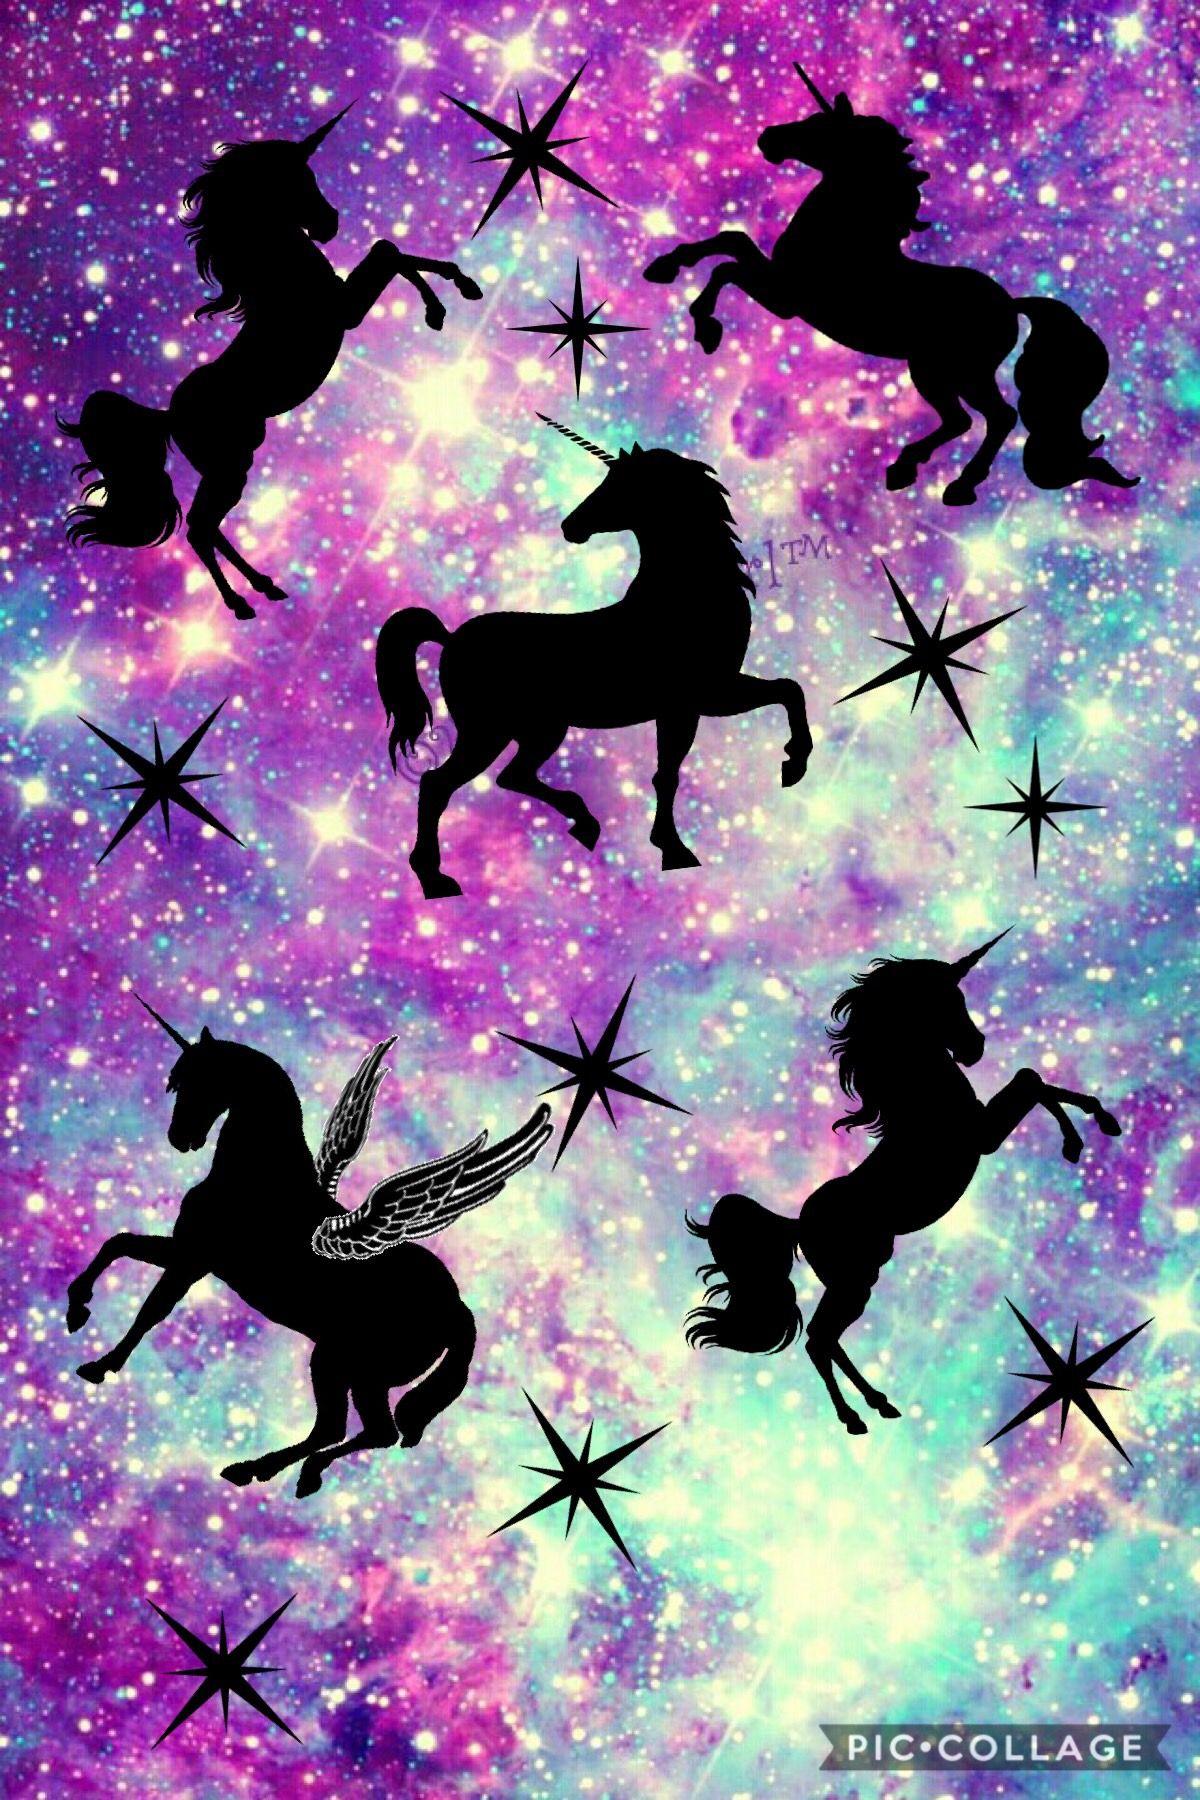 Unicorn Galaxy Screensaver Unicorn Wallpaper Neon Unicorn Wallpaper Wallpapers Unicorn Galaxy unicorn wallpaper laptop